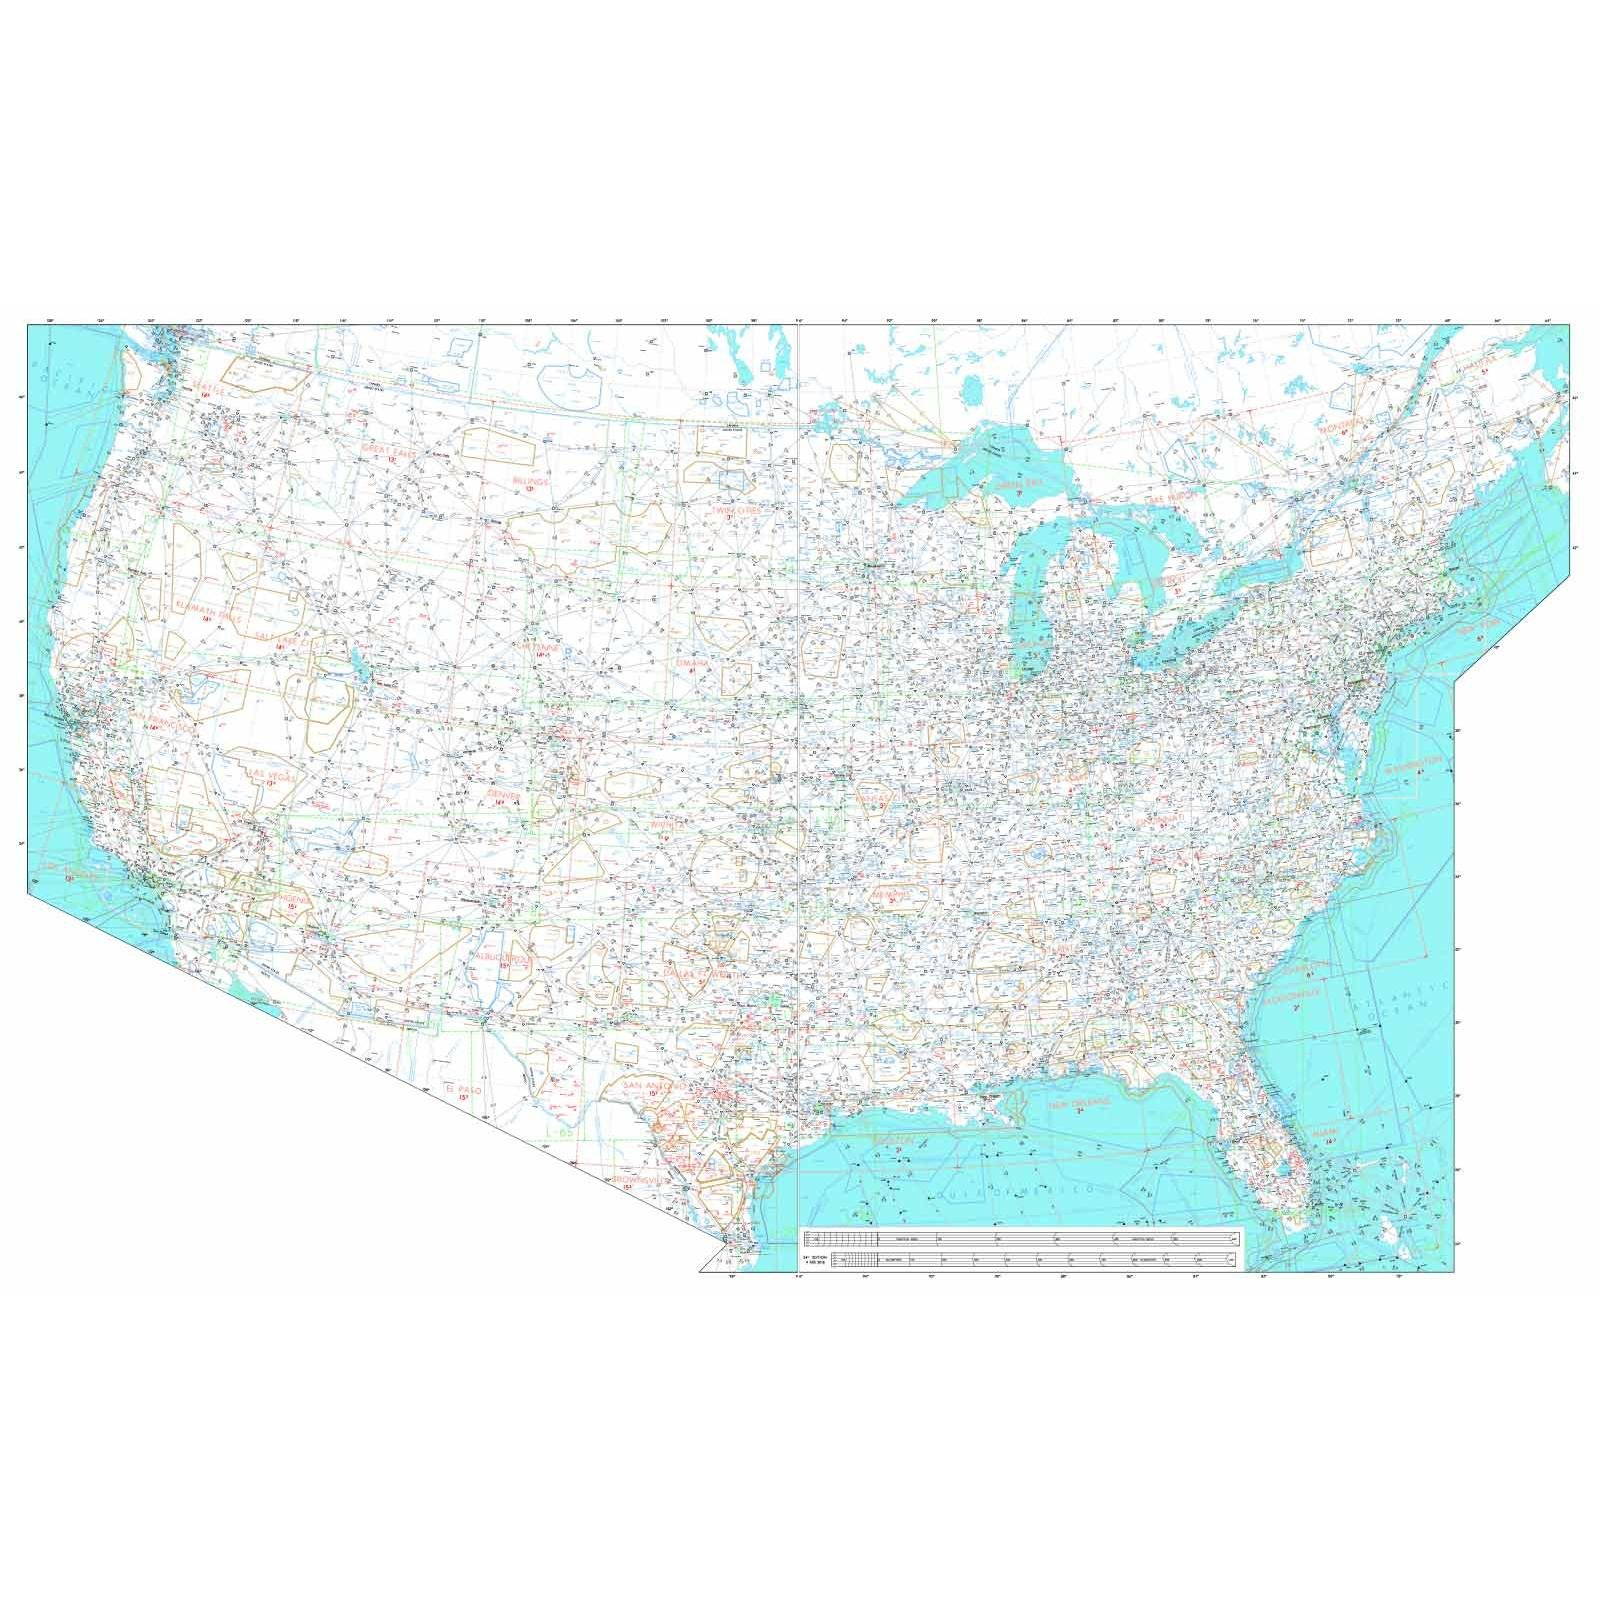 FAA Chart: U.S. IFR/VFR Low Altitude Planning Chart (FLAT)